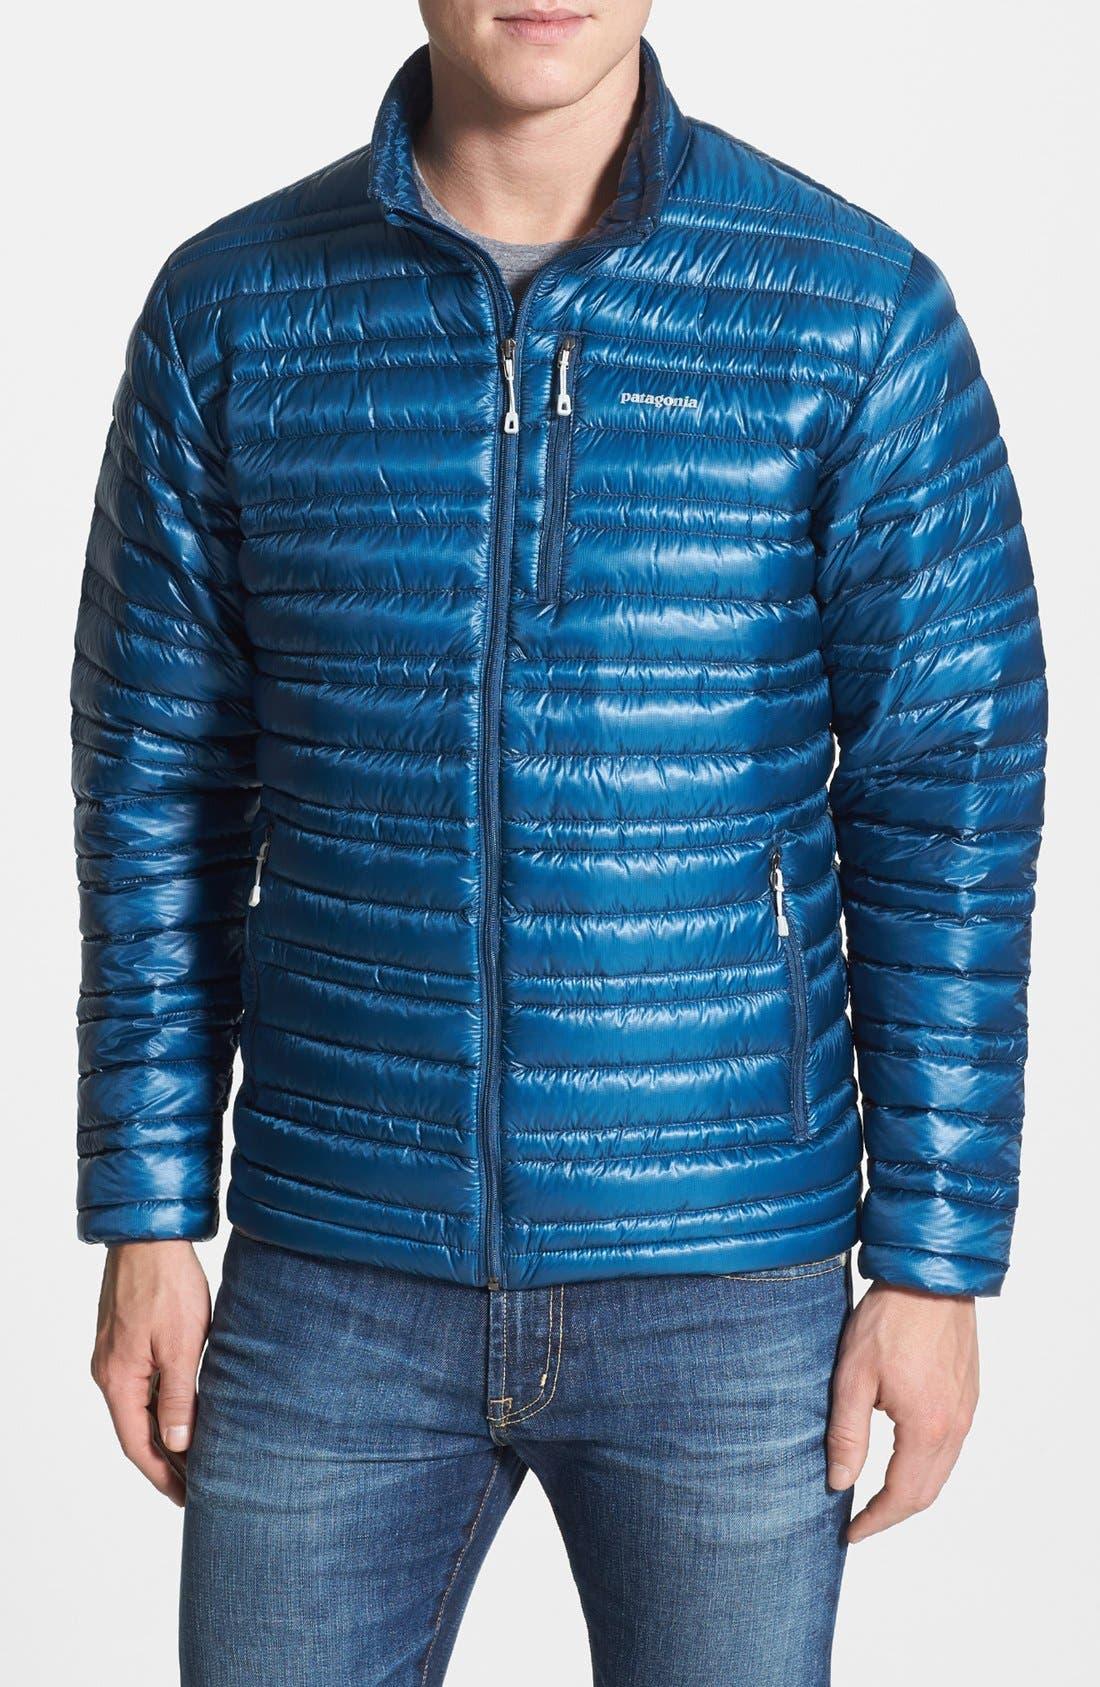 Alternate Image 1 Selected - Patagonia 'Ultralight' Water Repellent Down Jacket